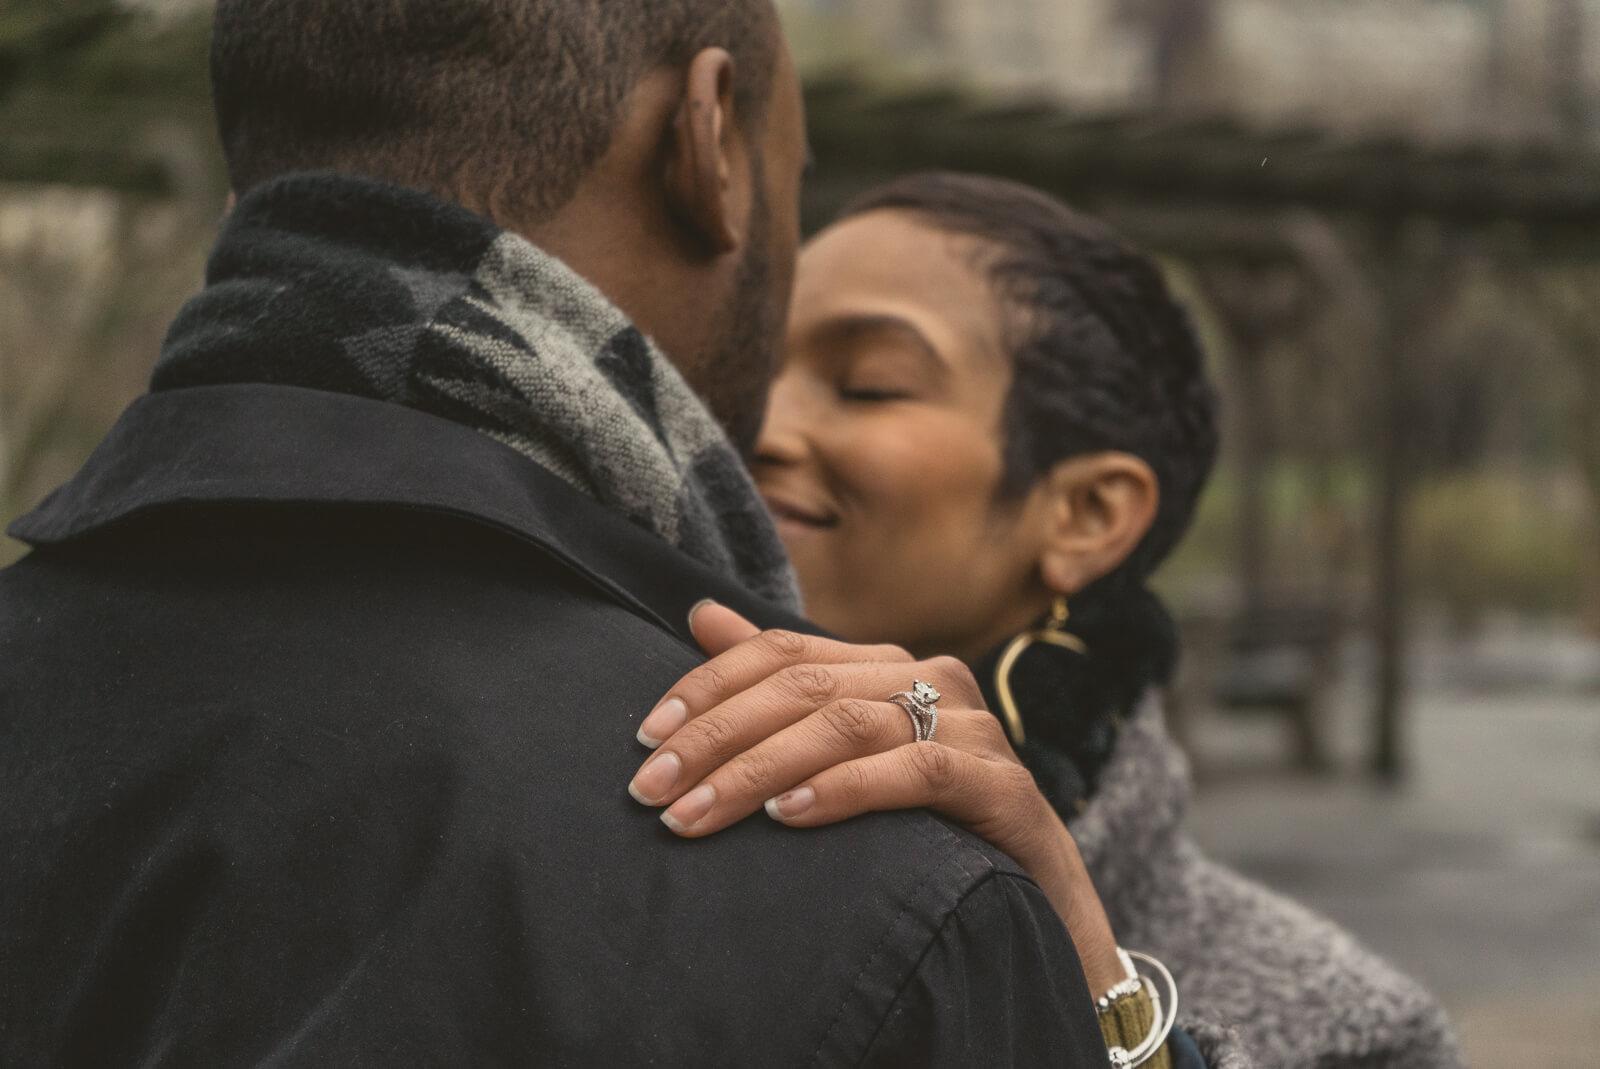 Photo Pine Bank bridge Central Park Marriage Proposal | VladLeto